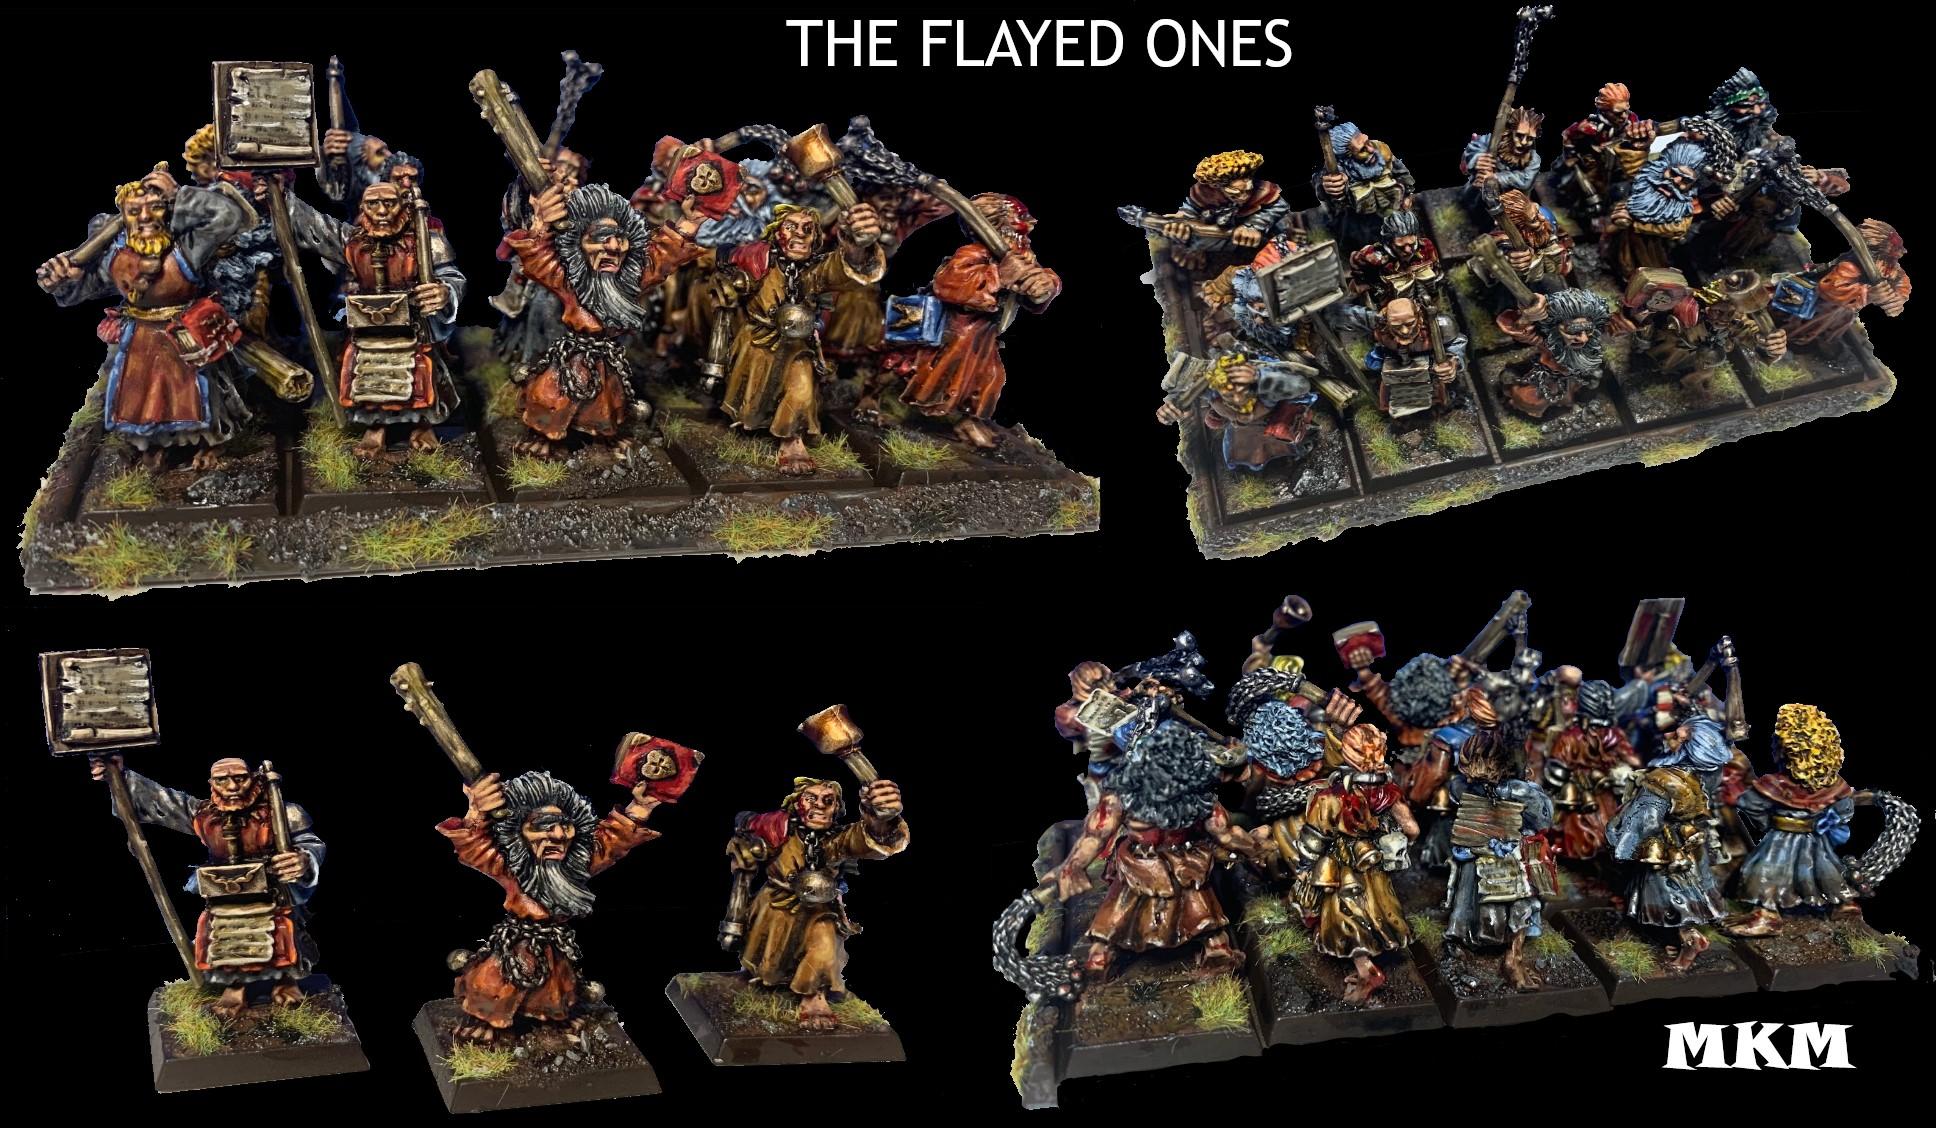 THE FLAYED ONES - 15 FLAGELLANTS